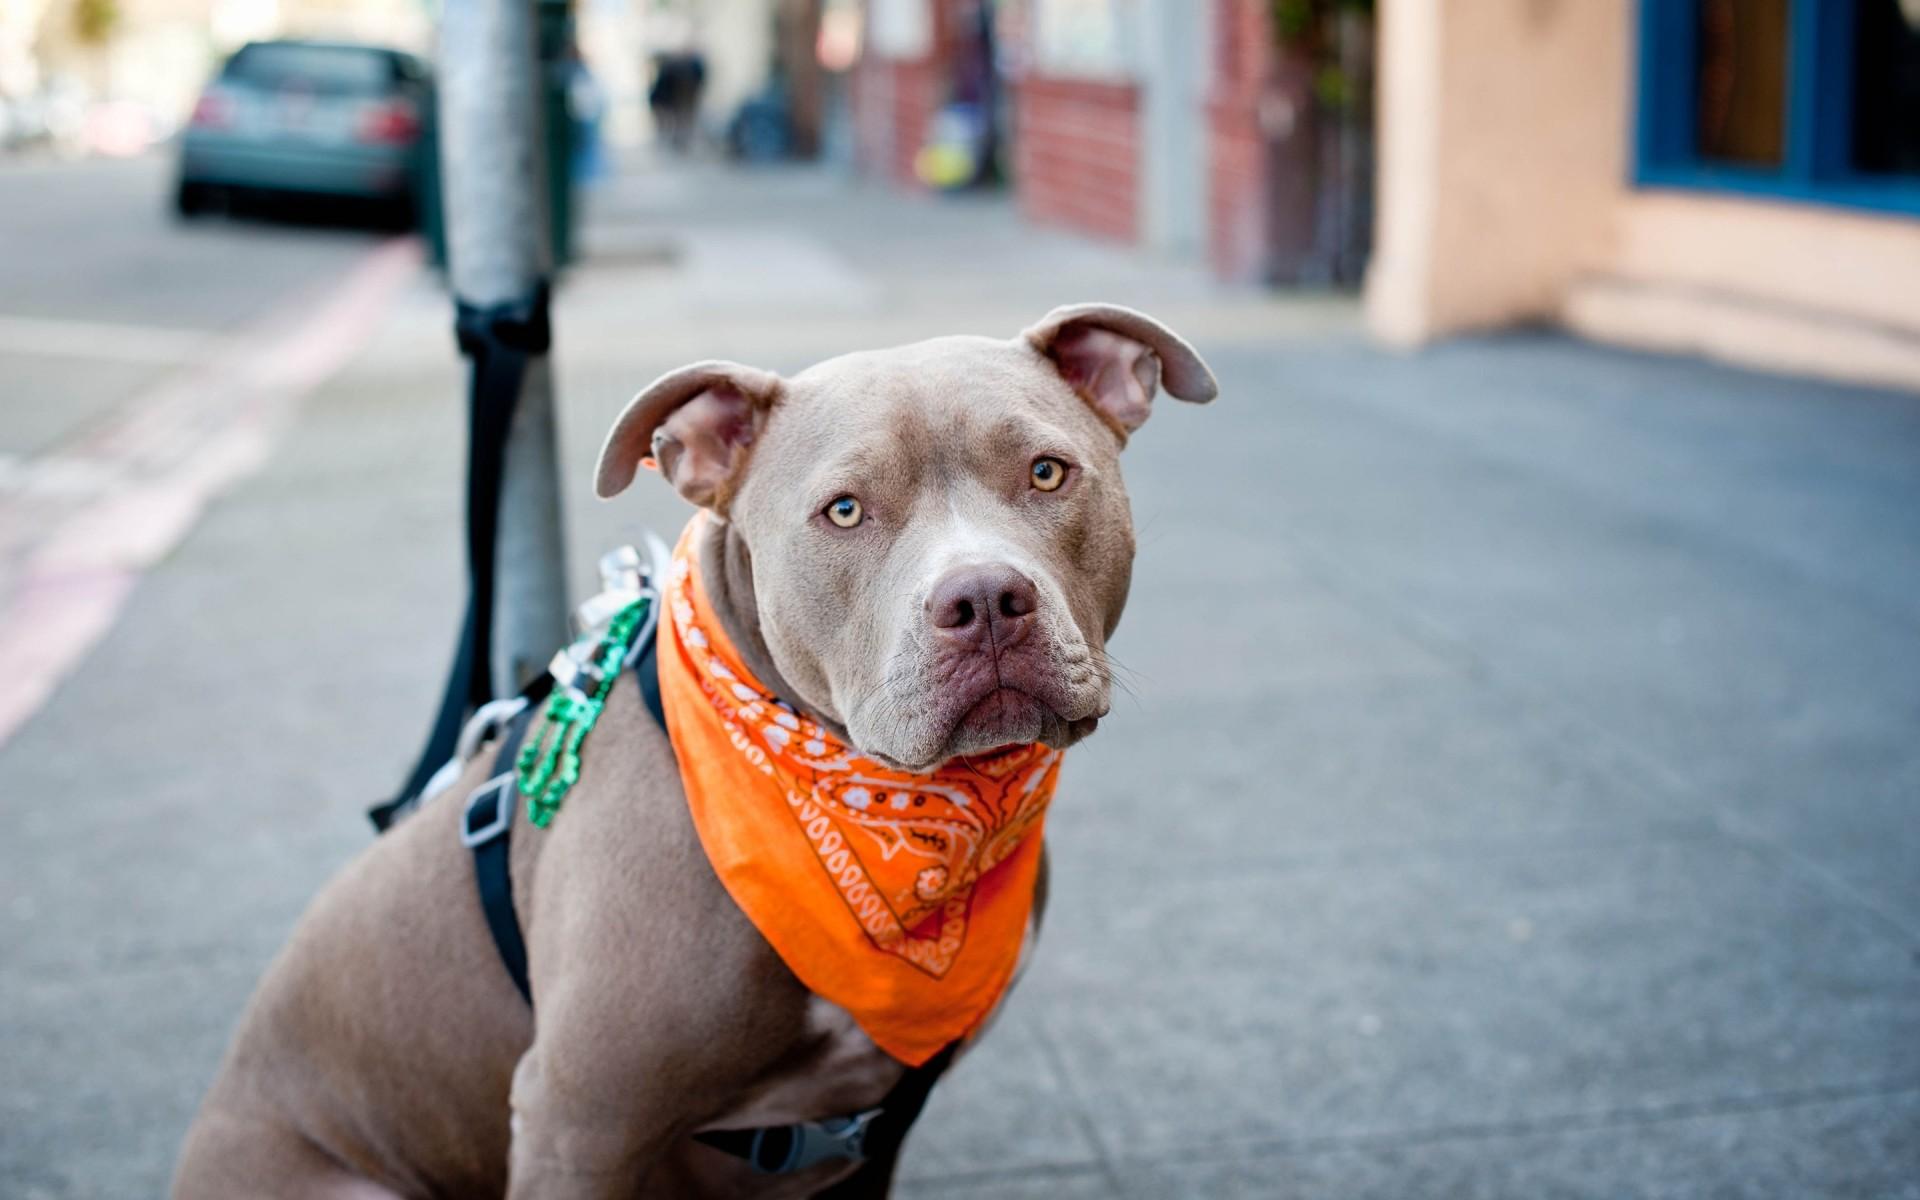 Wallpaper Cute Pitbull Dog – HD Wallpaper Expert